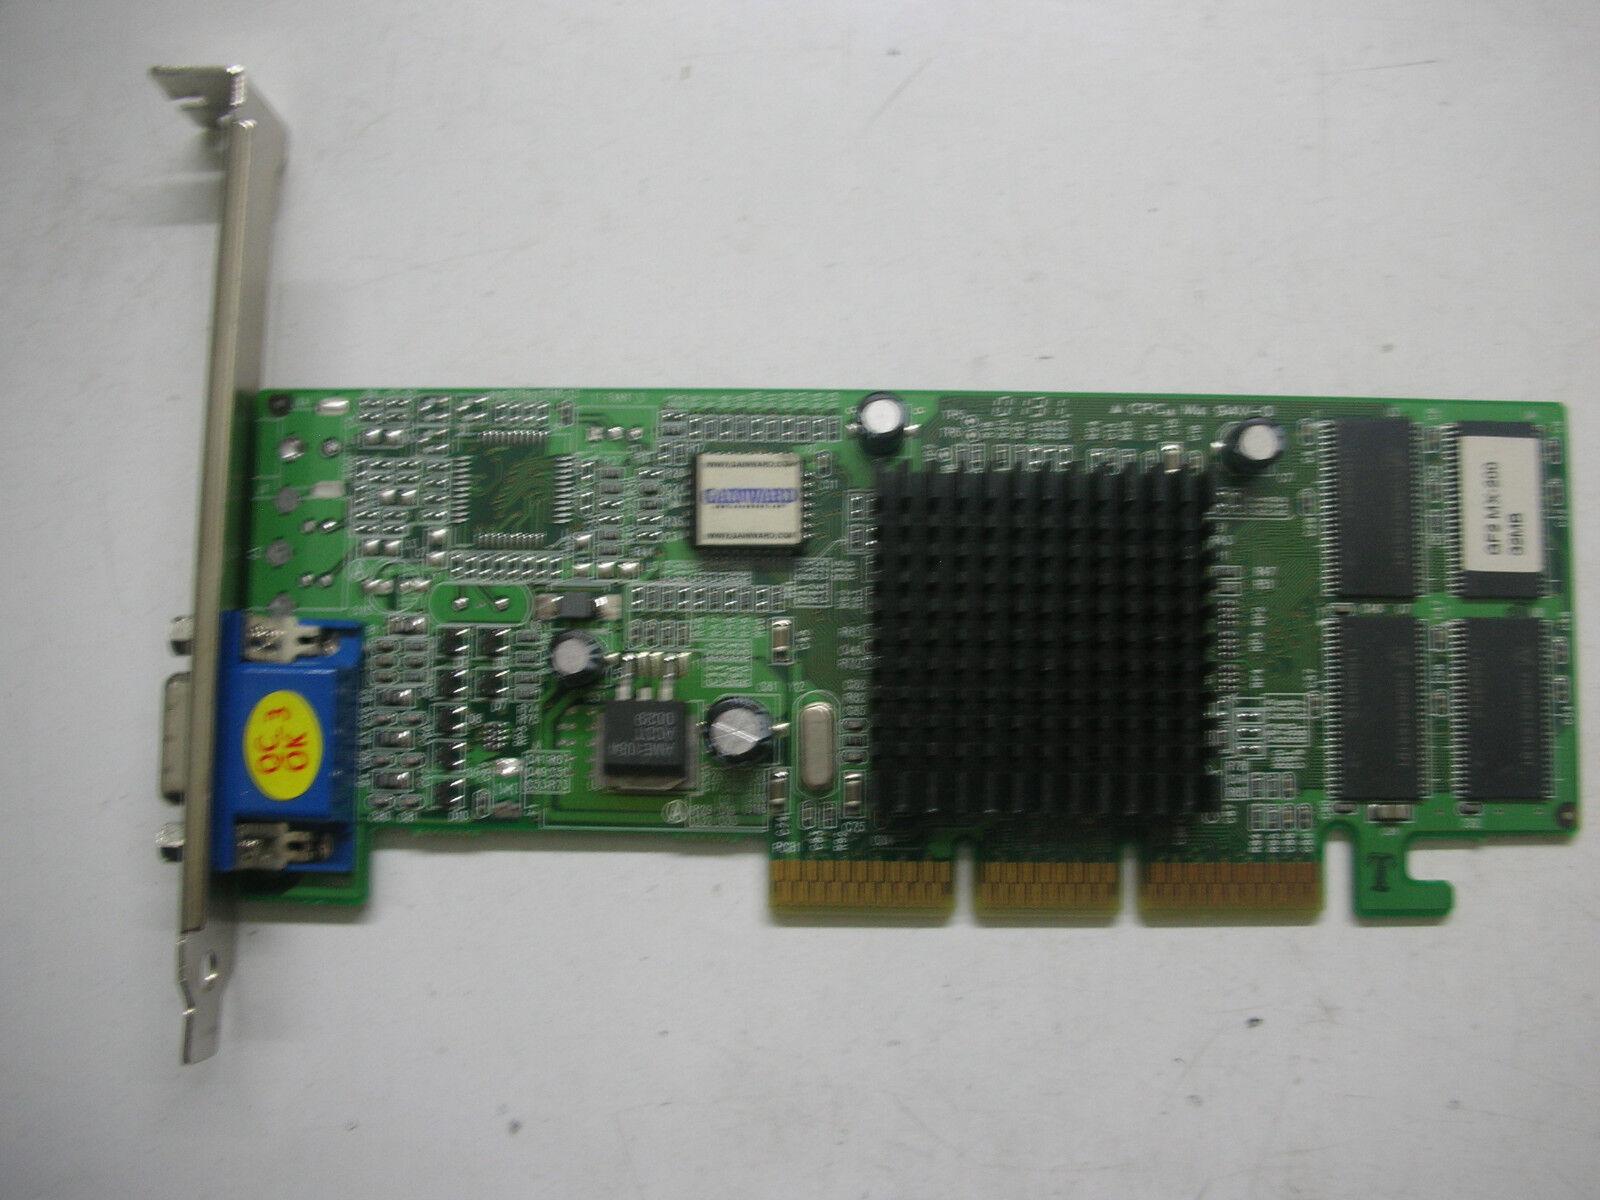 Gainward Nvidia Geforce MX200 32mb AGP